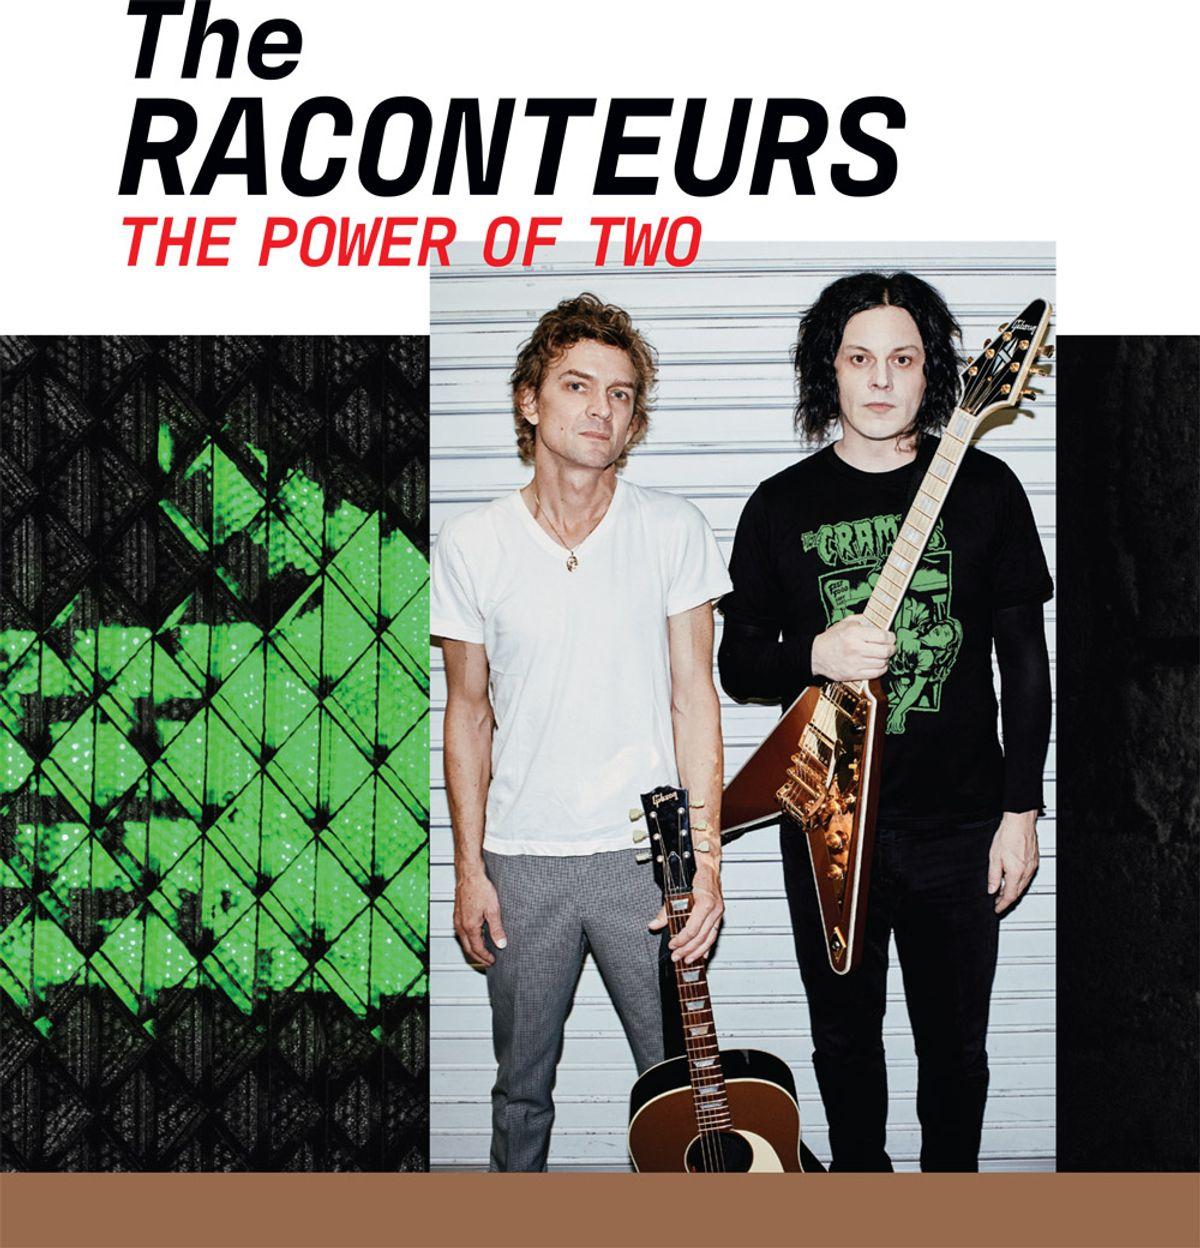 The Raconteurs' Jack White and Brendan Benson